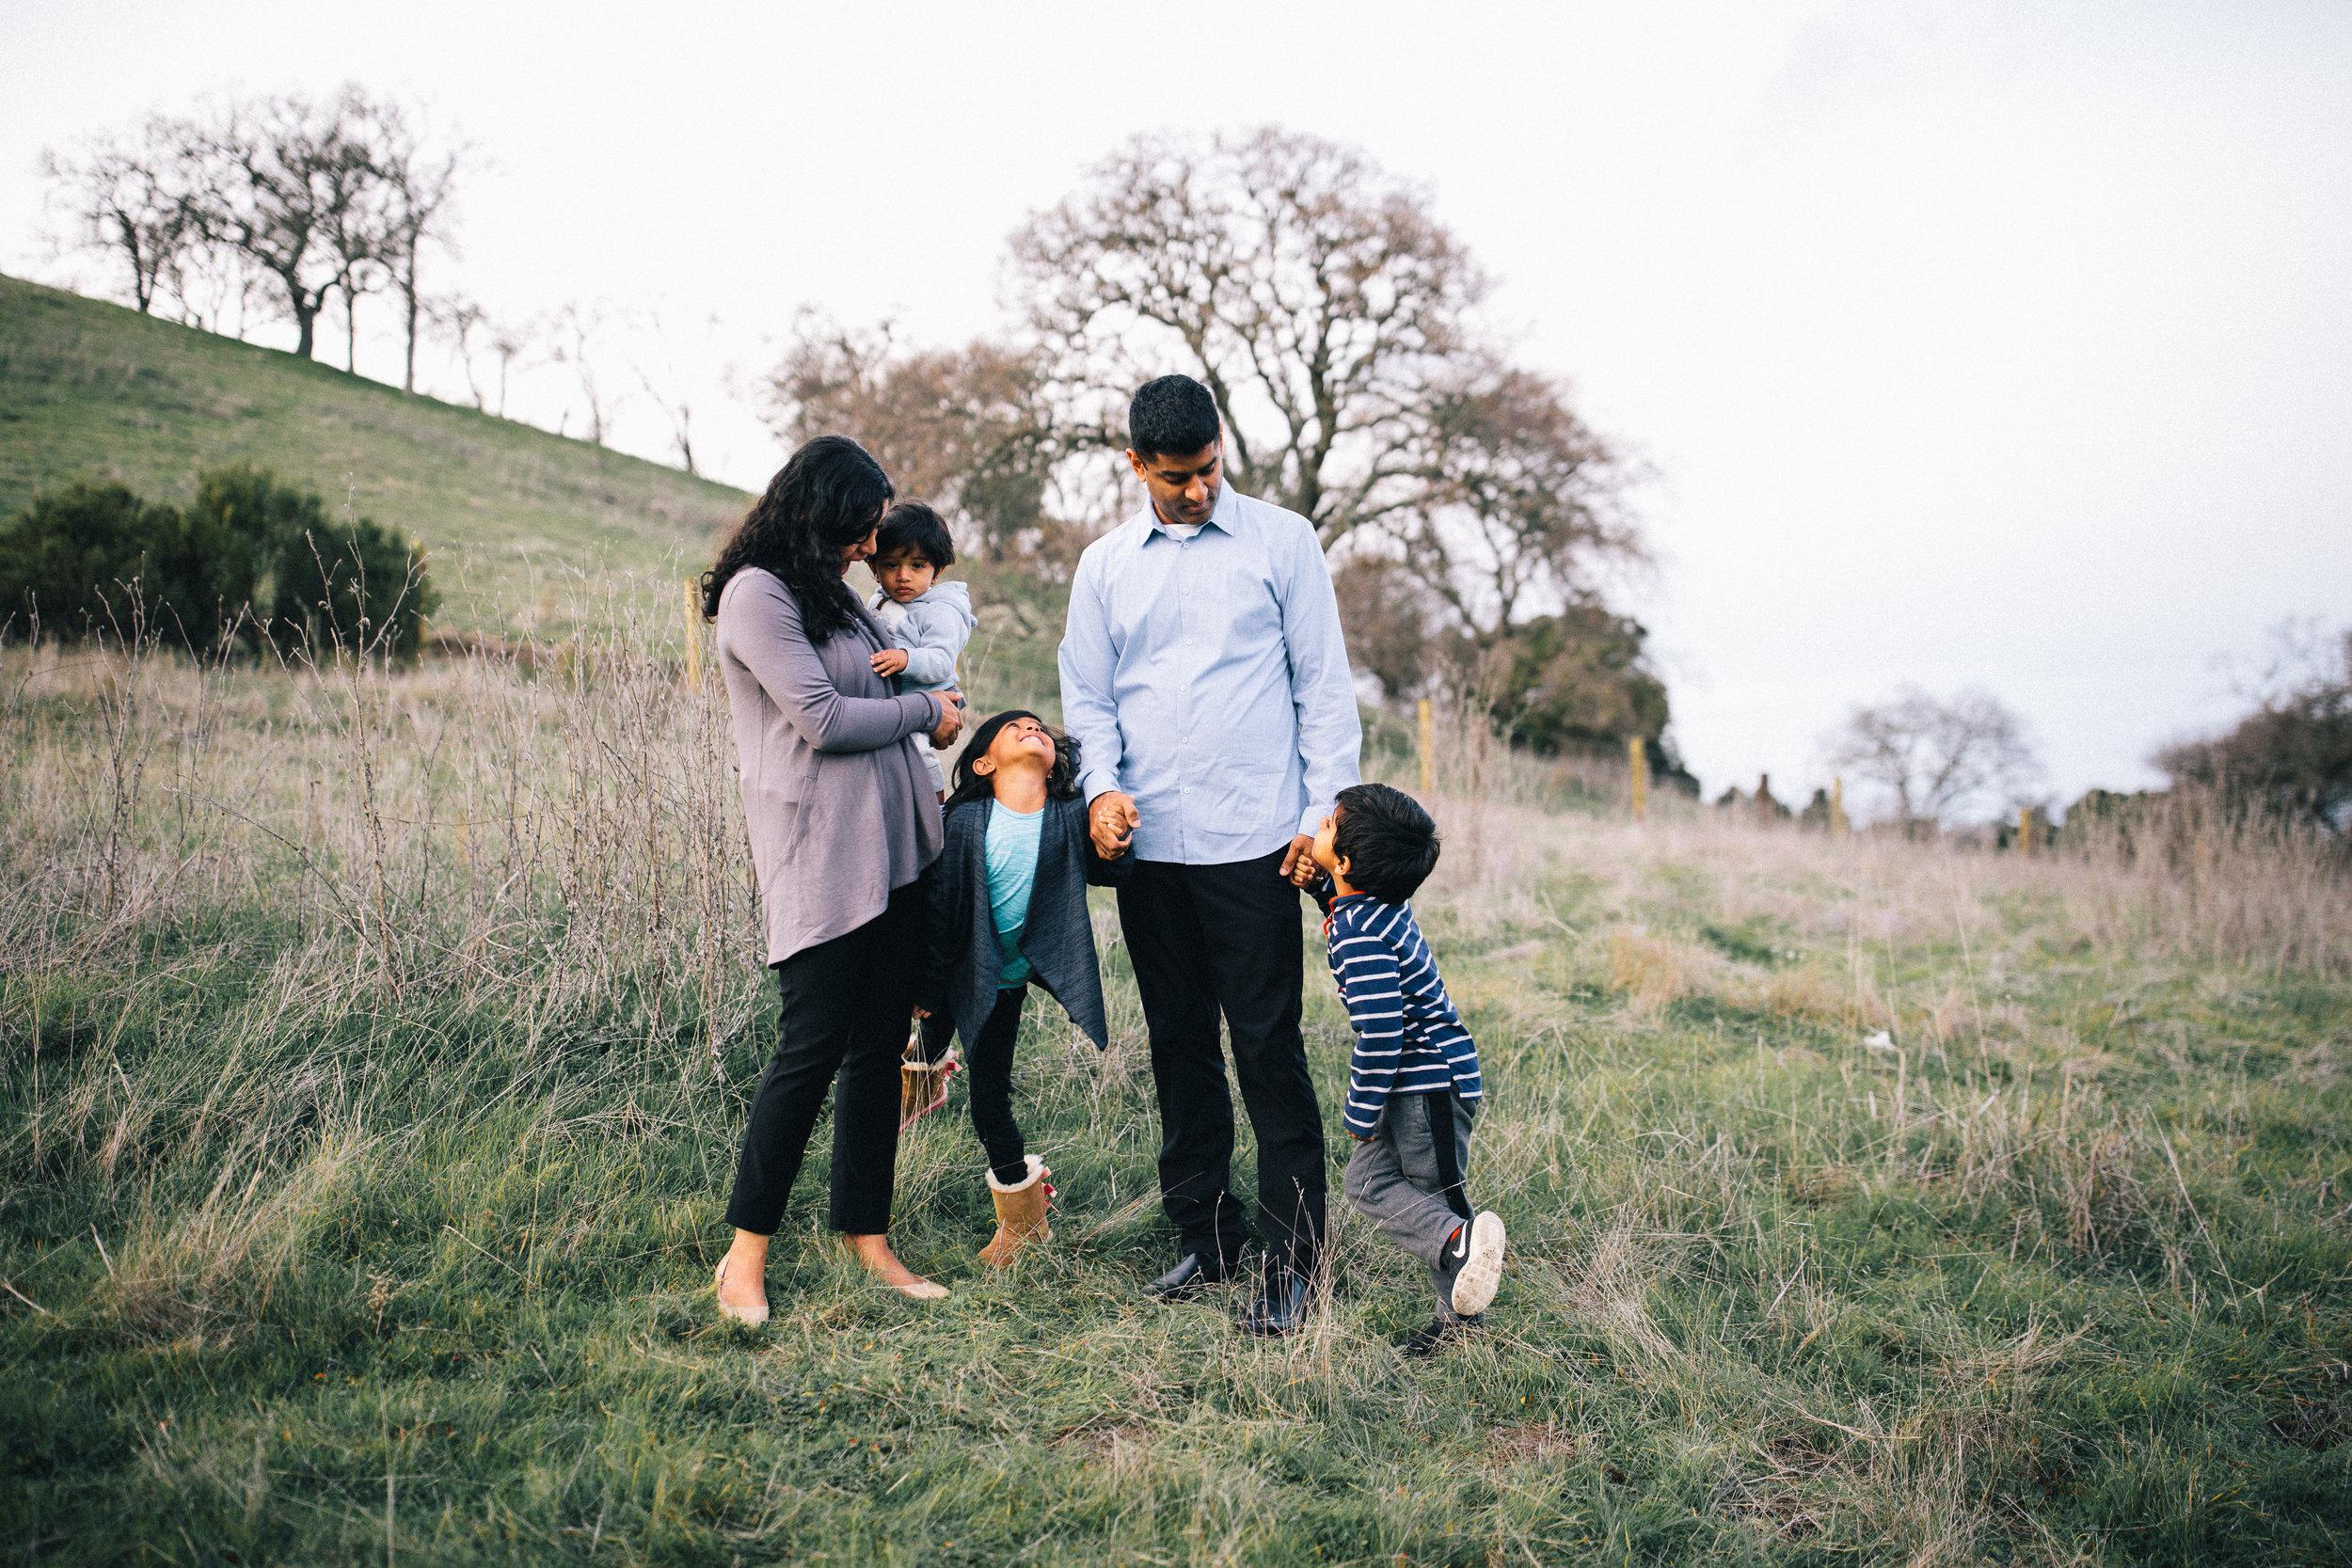 2018_01_01 Ahmad Family Session Blog Photos Edited Full Resolution 0035.jpg